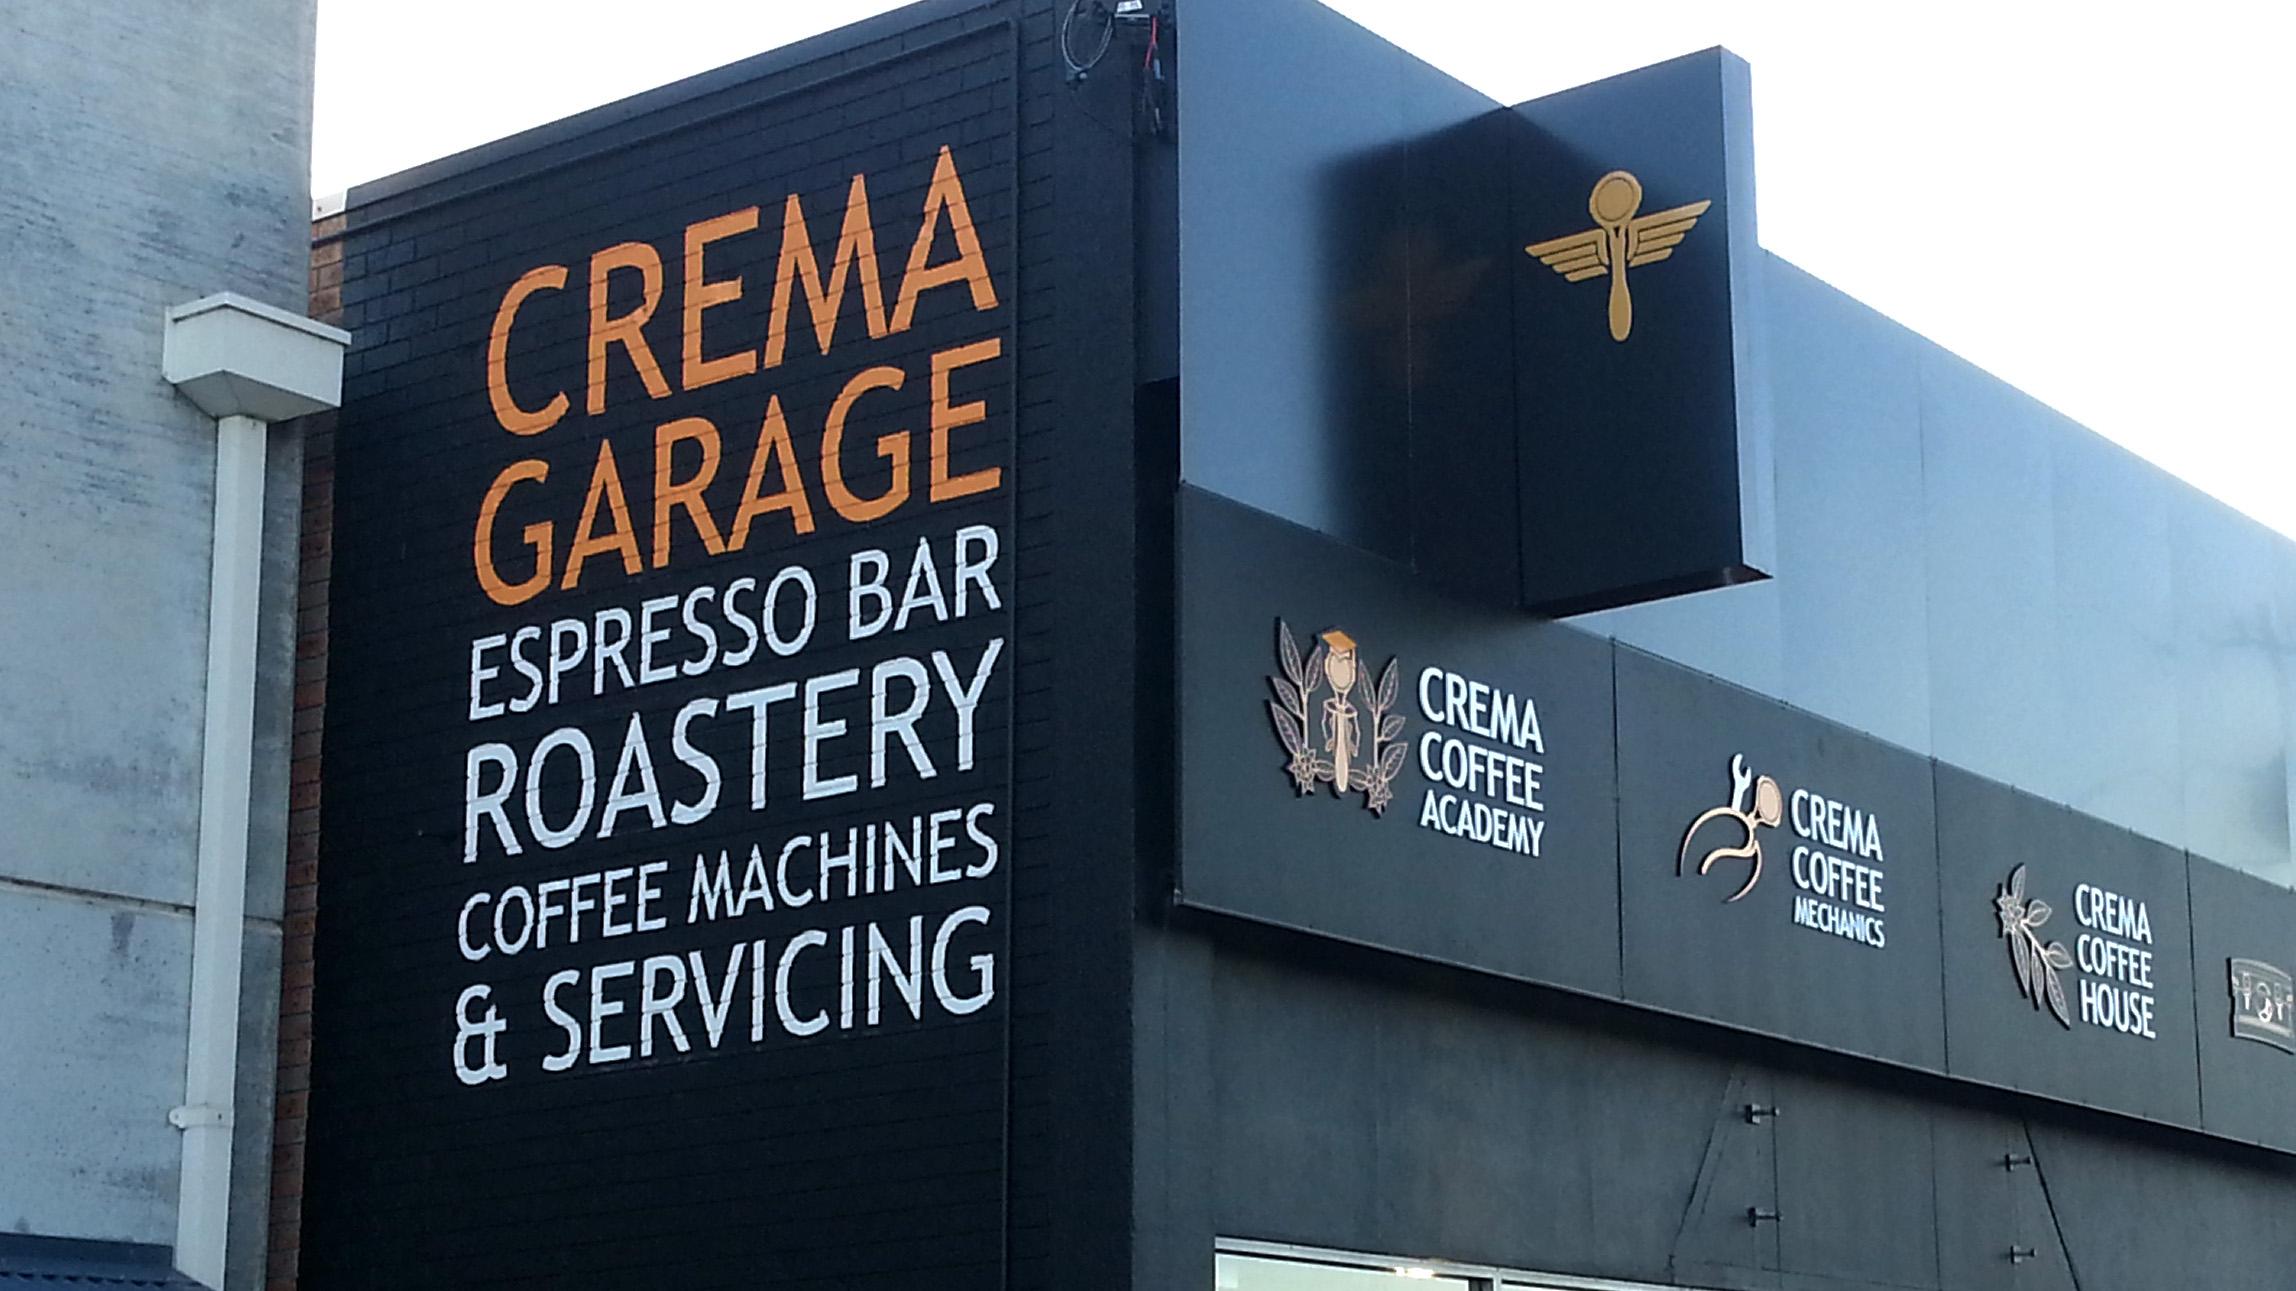 crema garage hand painted sign on wall.jpg